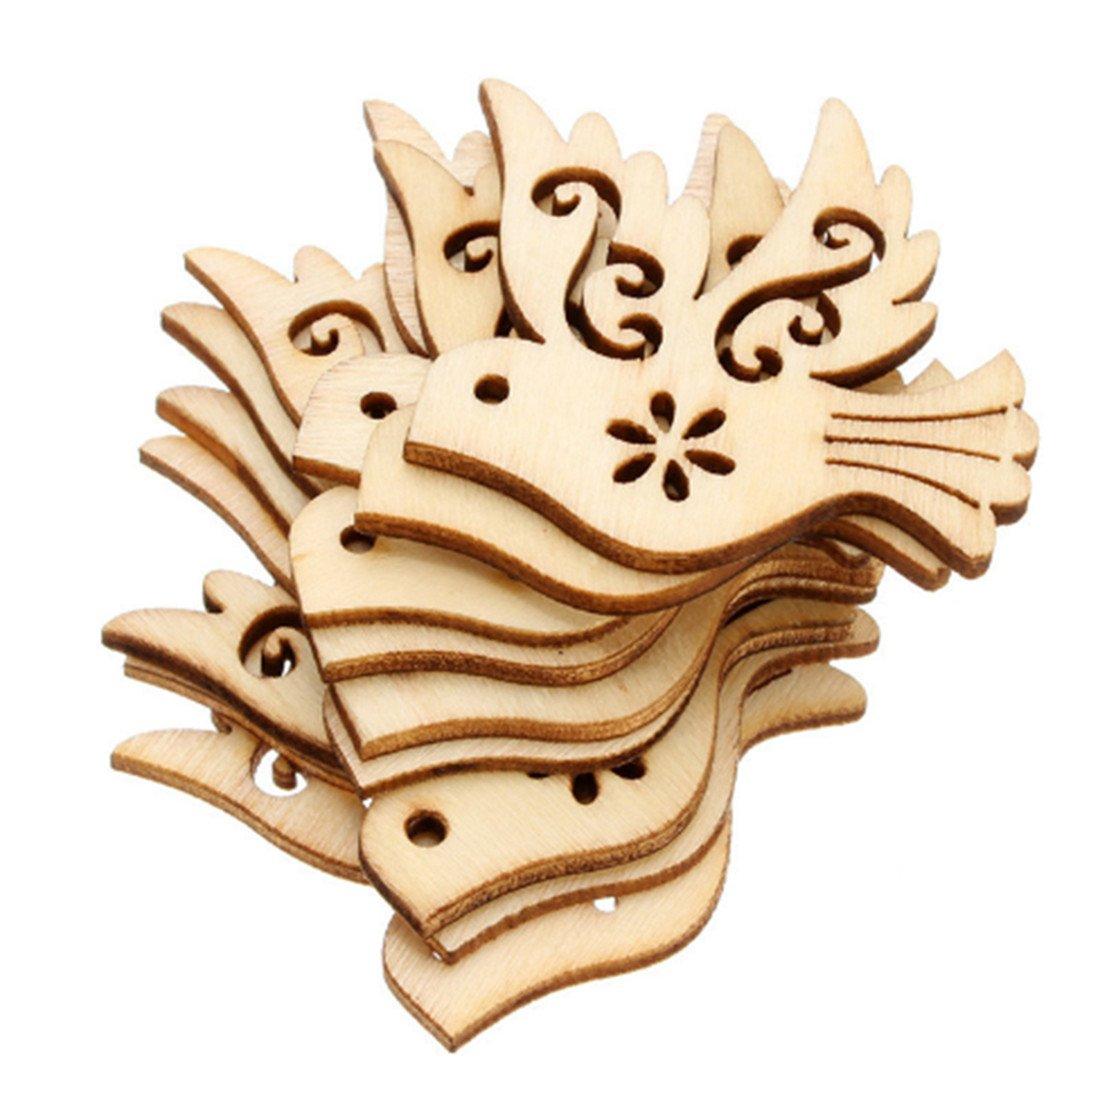 UNKE 10 Pcs Pigeon Love Birds Wooden Embellishments DIY Crafts Hanging Ornament Home Wedding Decoration